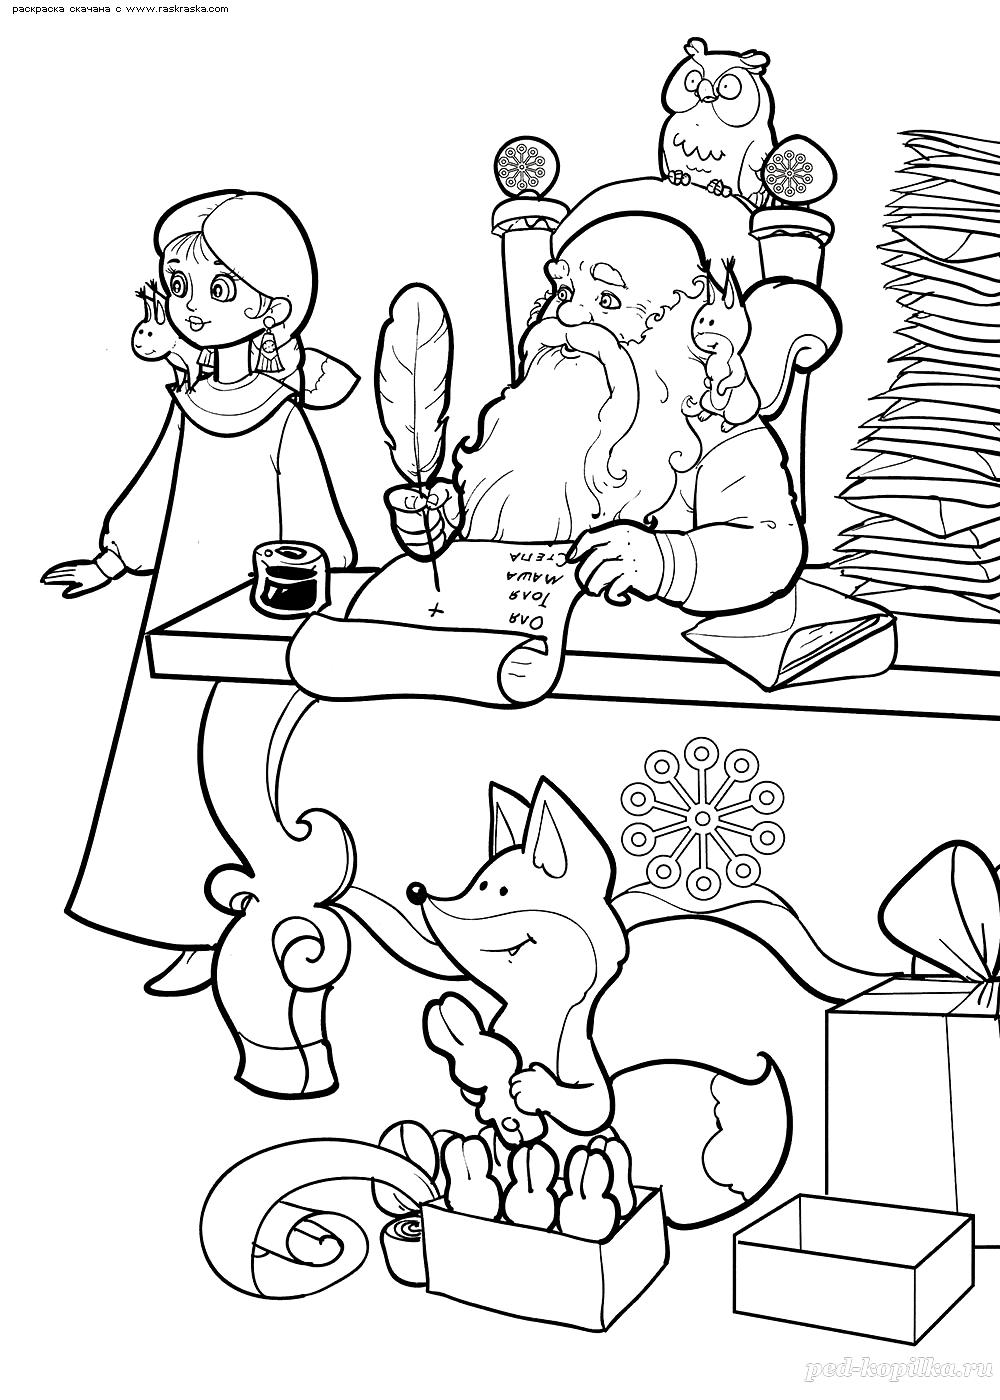 Раскраска Дед Мороз разбирает письма . Раскраска дед мороз, снегурочка